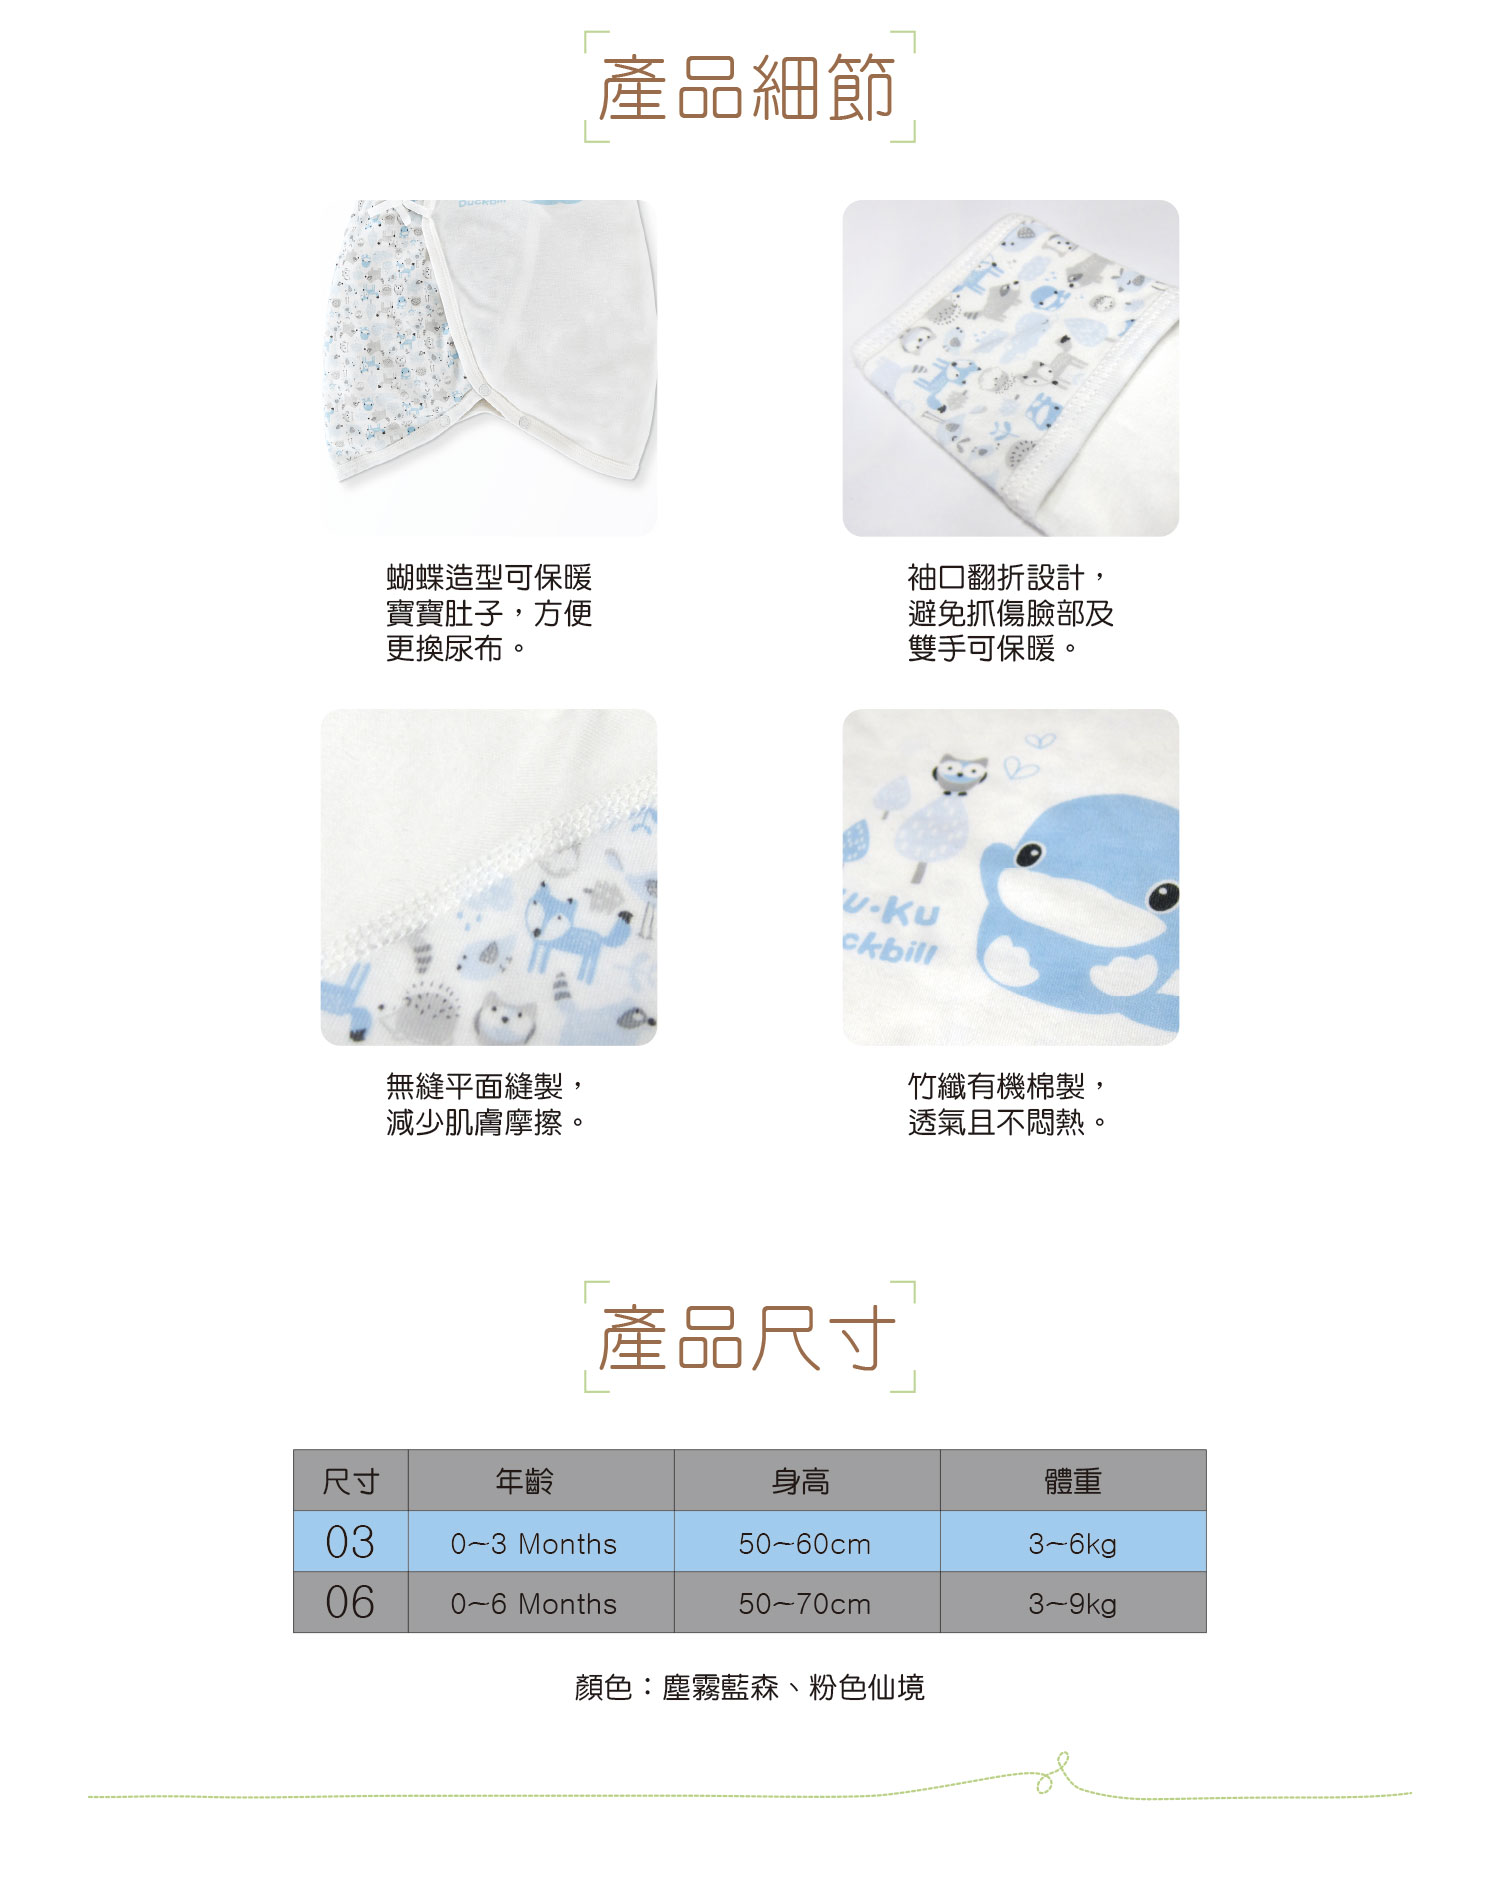 proimages/Cottons&BabyClothing/Organic_Bamboo/2768/2768_2.jpg